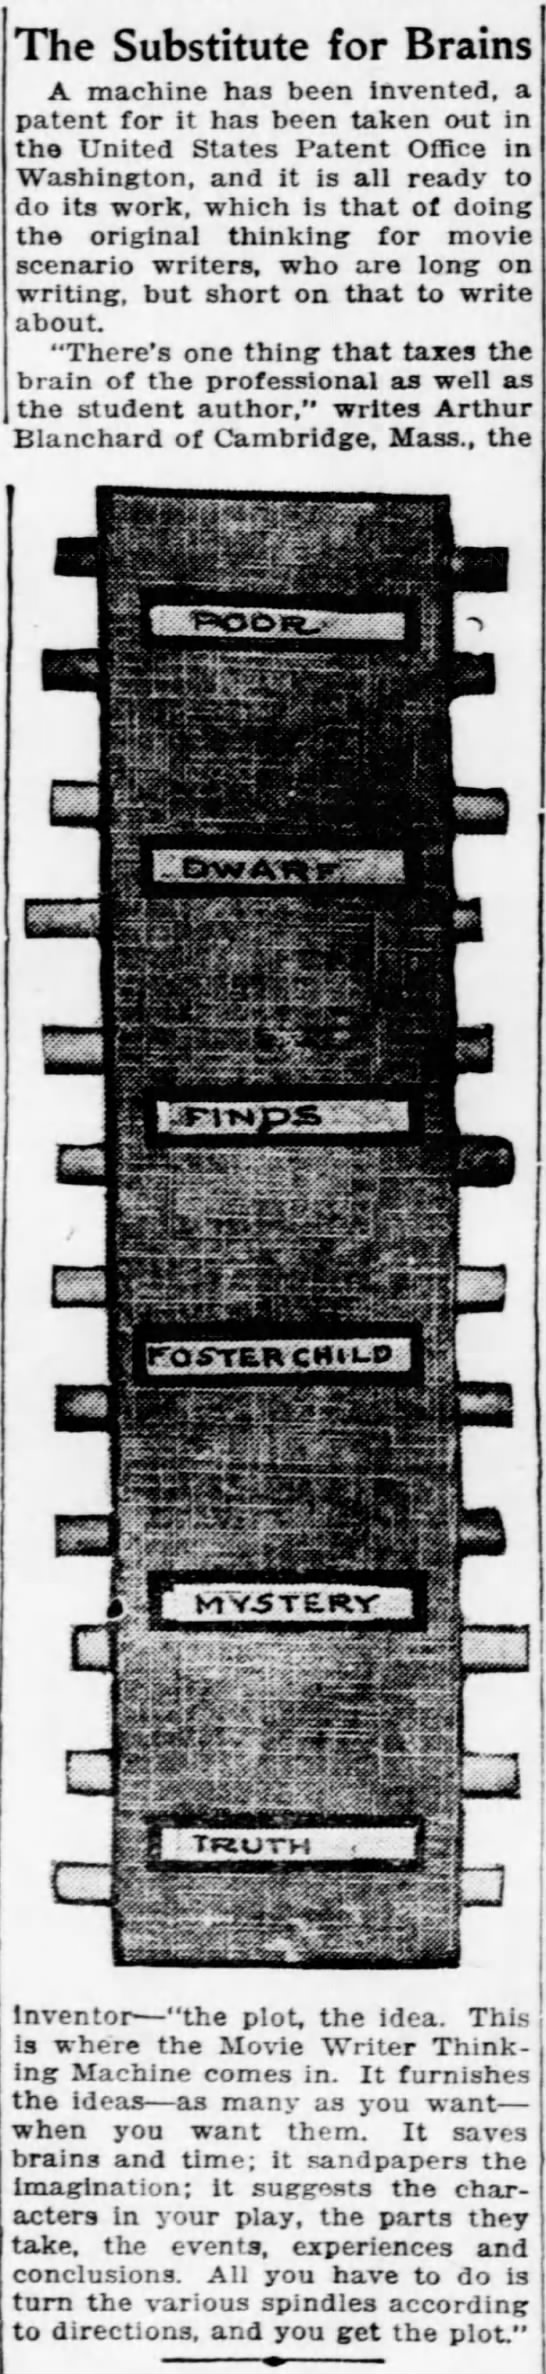 randomstorymachine6 Old Print Article: Blanchard's Story Generator Machine, Brooklyn Daily Eagle (1921)